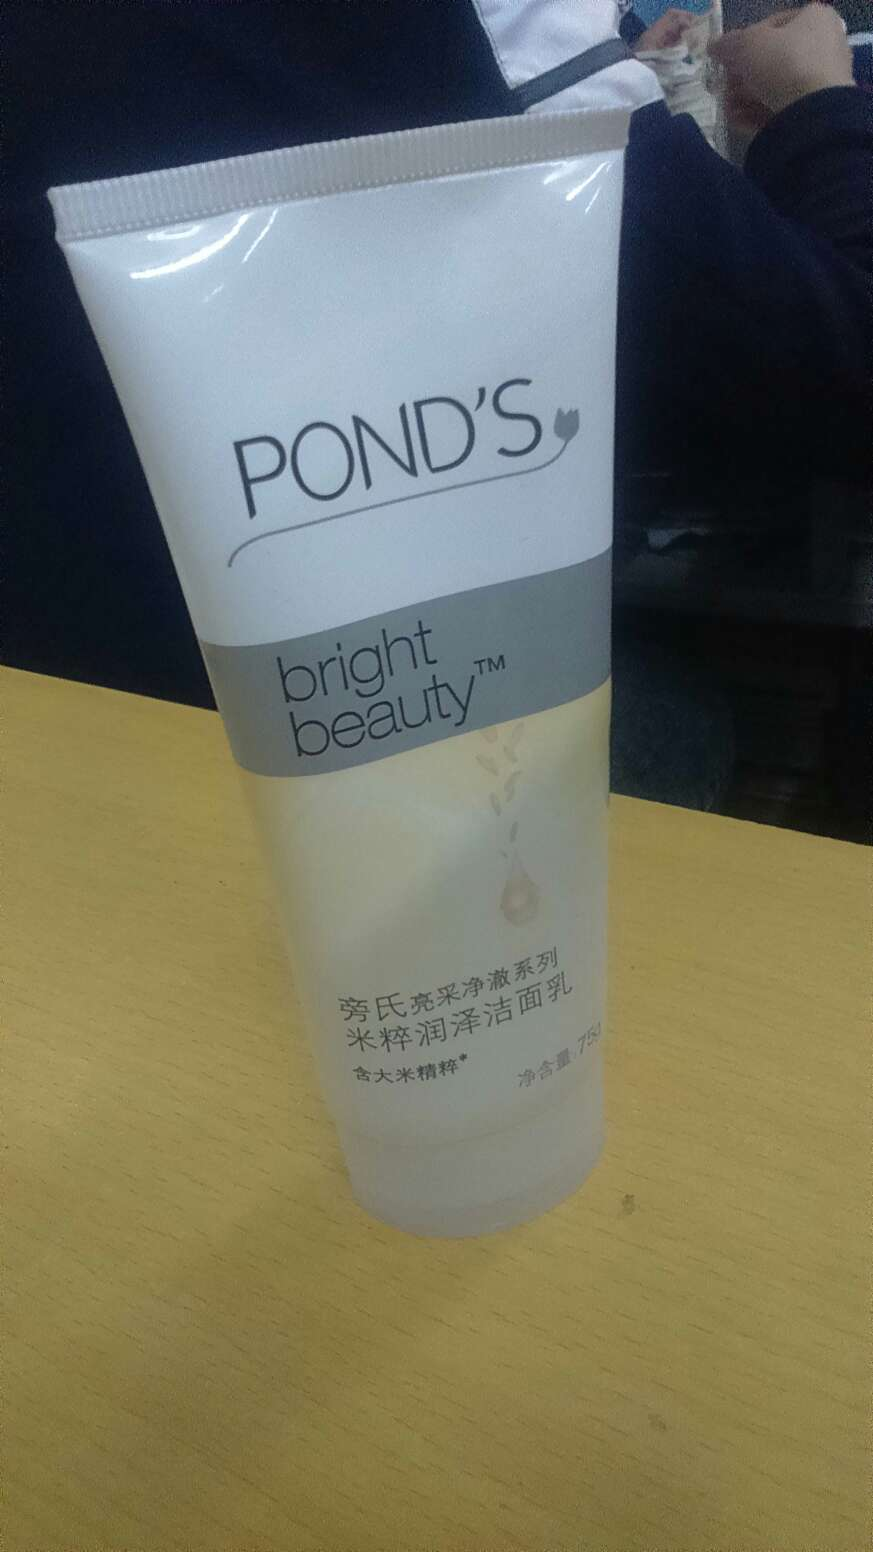 online shop branded indonesia 00277872 cheapestonline